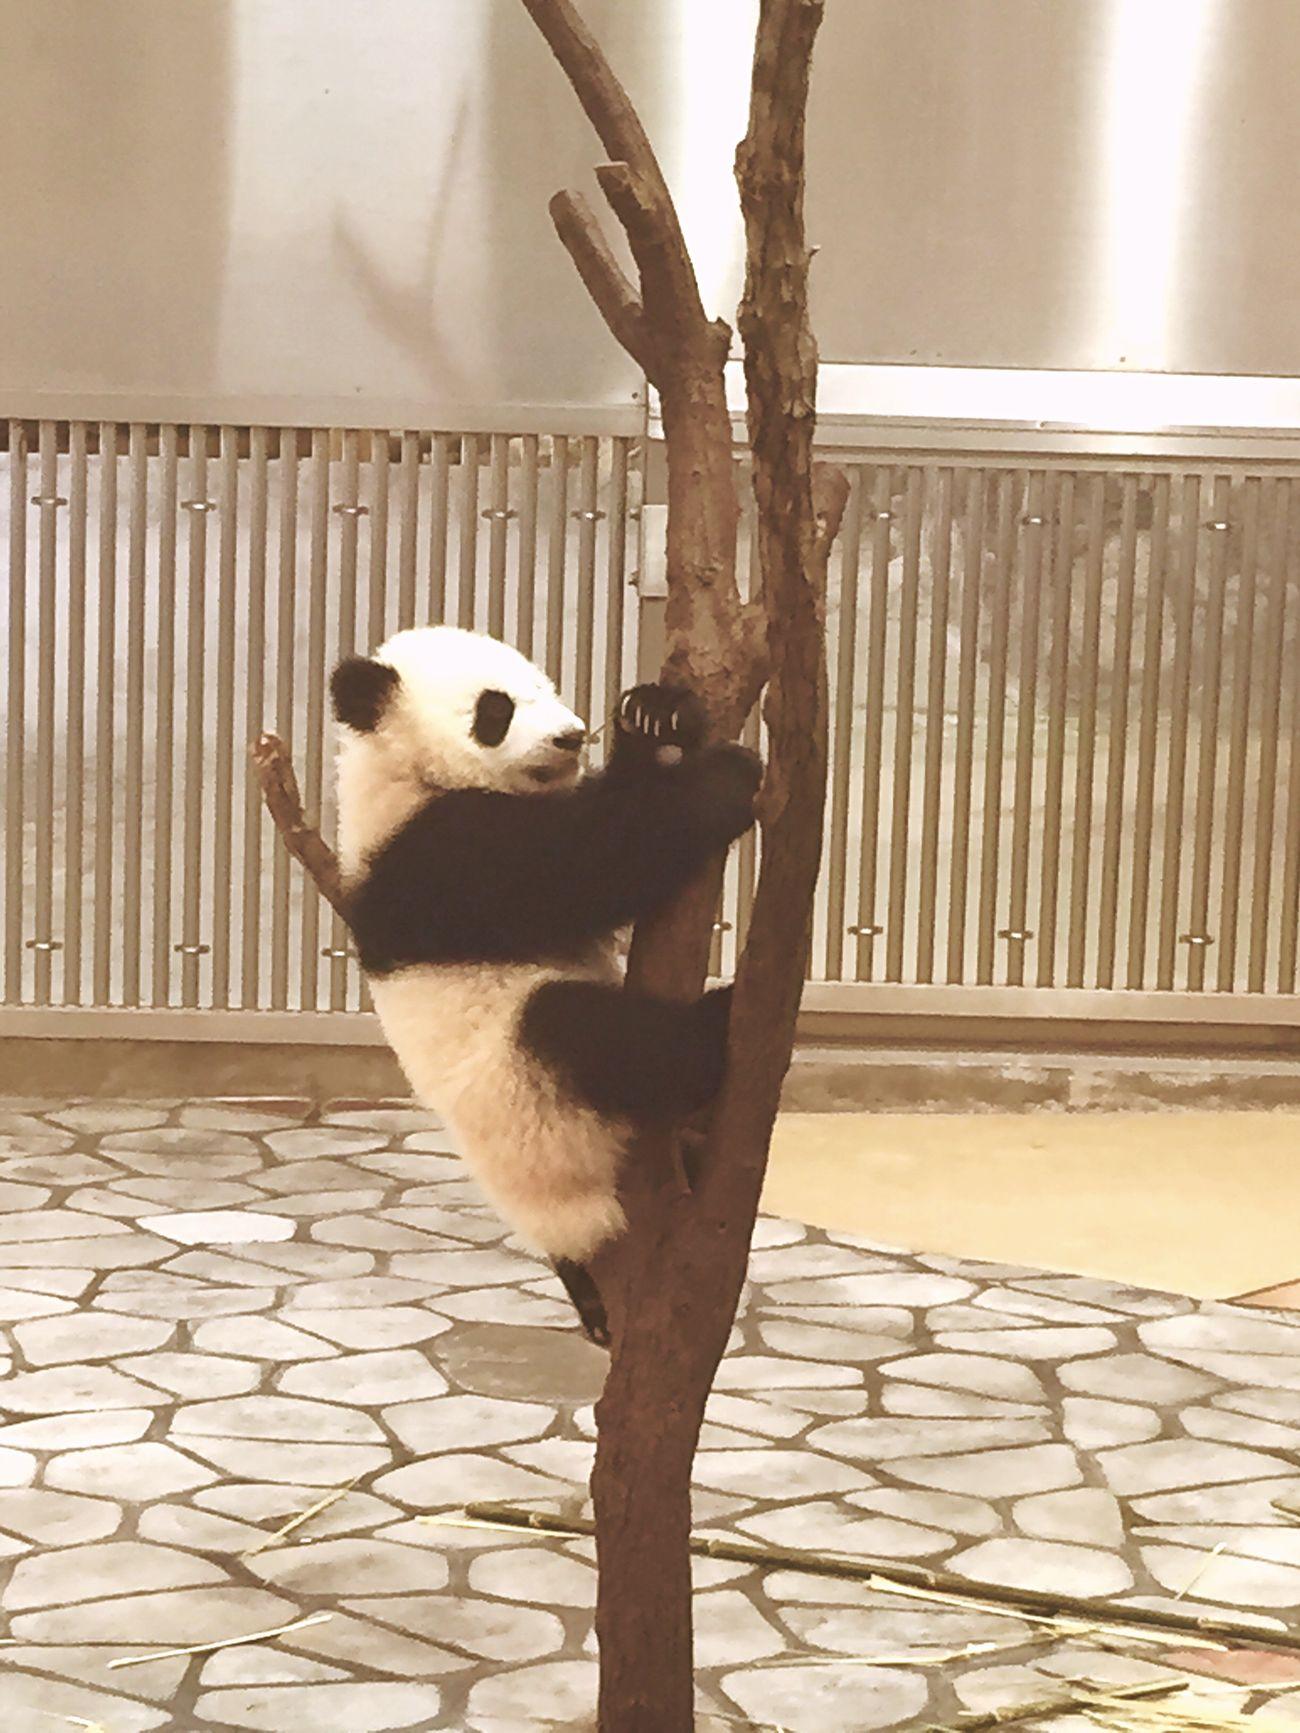 Taking Photos Panda Animals Cute